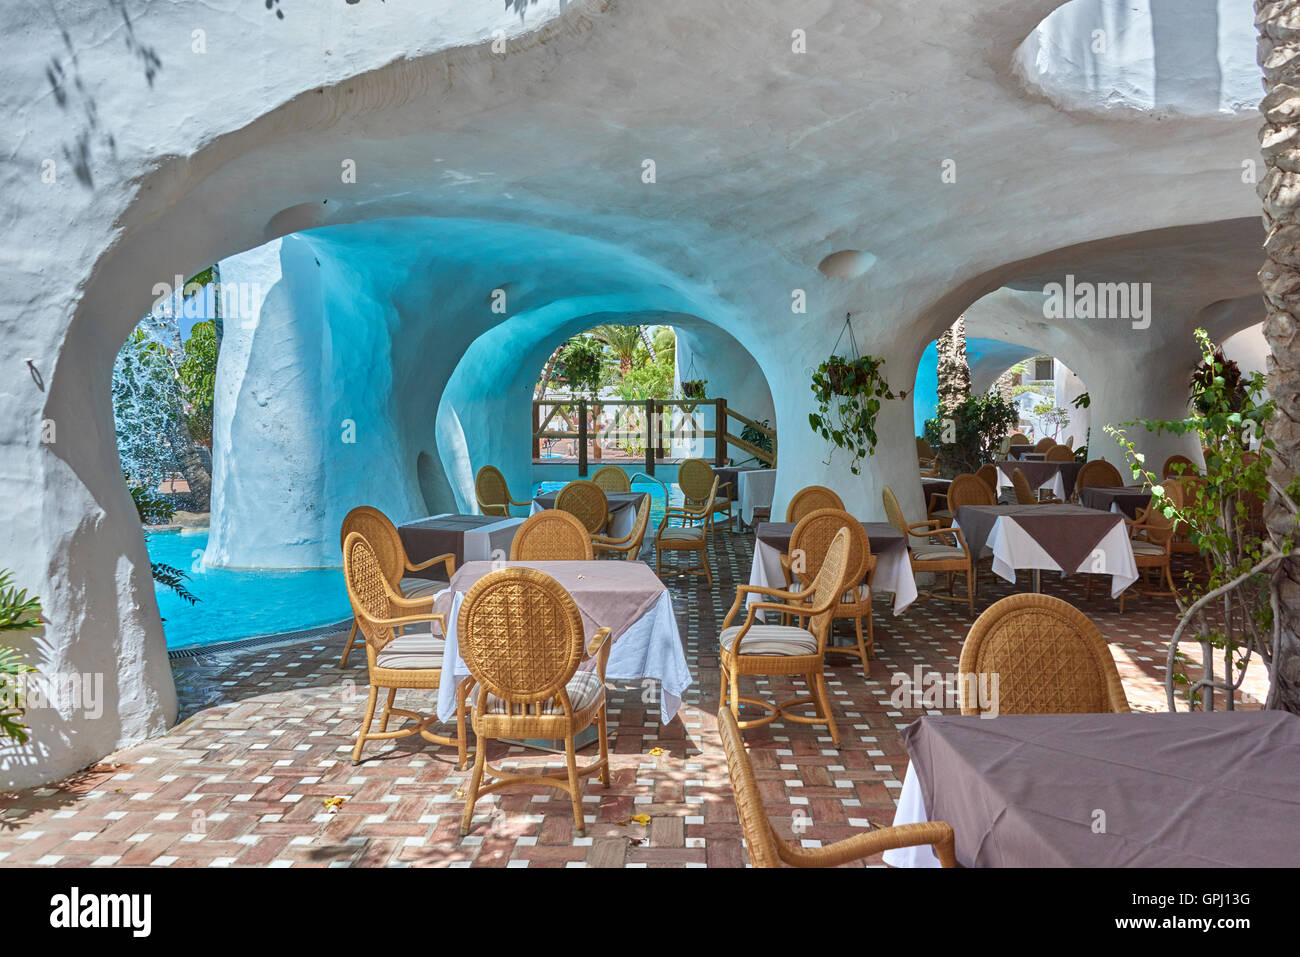 Hotel Jardin Tropical Costa Adeje Tenerife Stock Photo 117180660